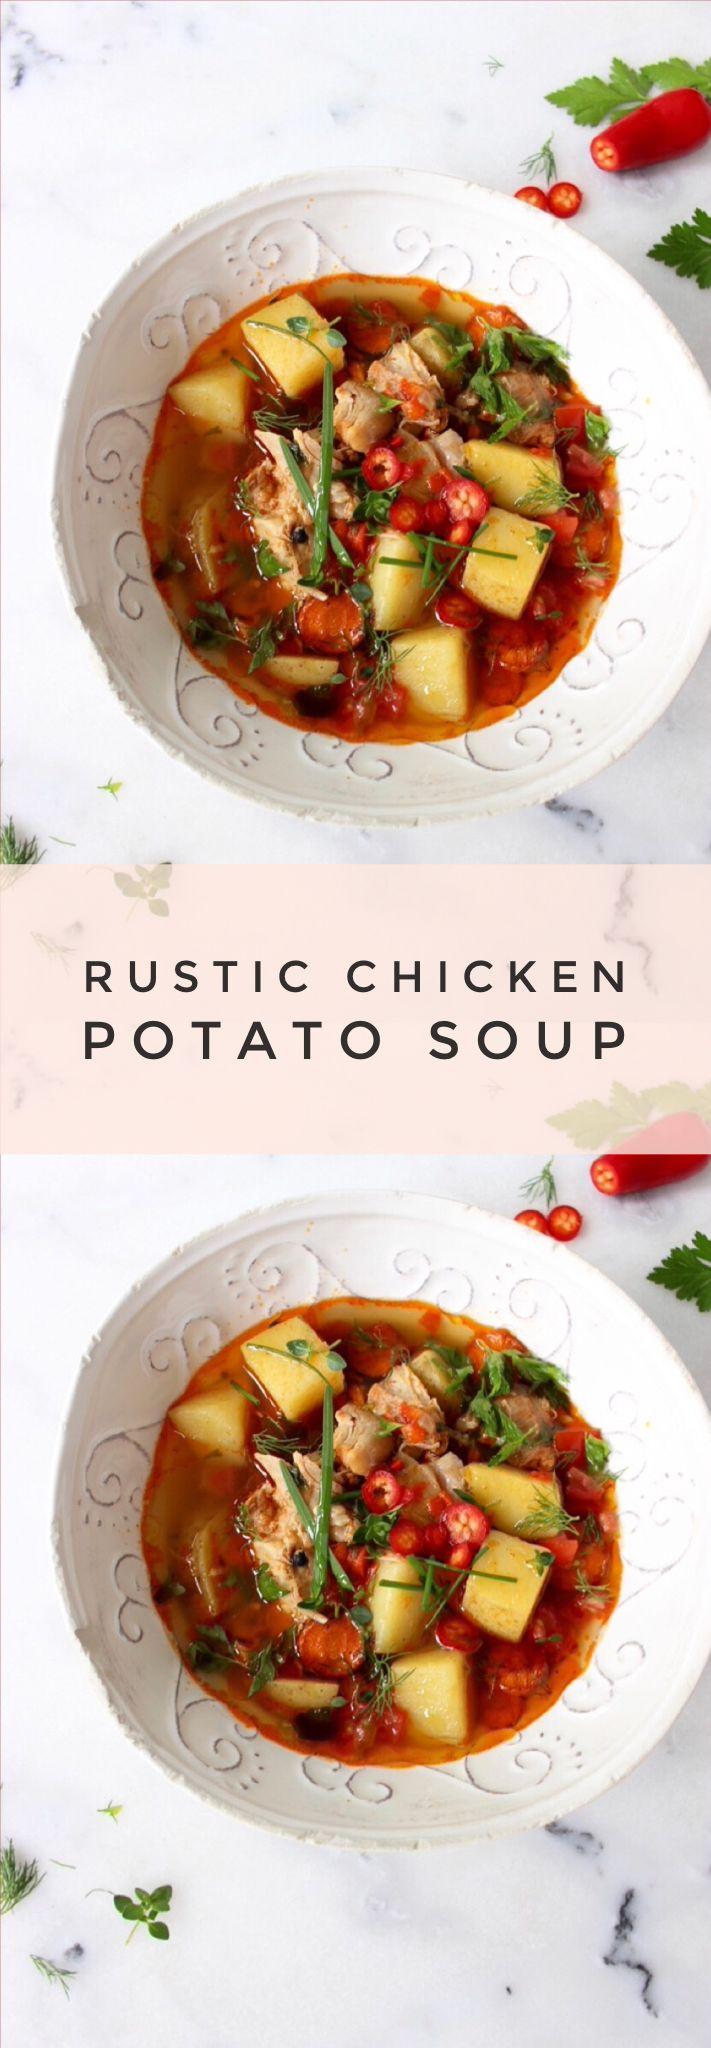 Rustic Chicken & Potato Soup Recipe | CiaoFlorentina.com @CiaoFlorentina